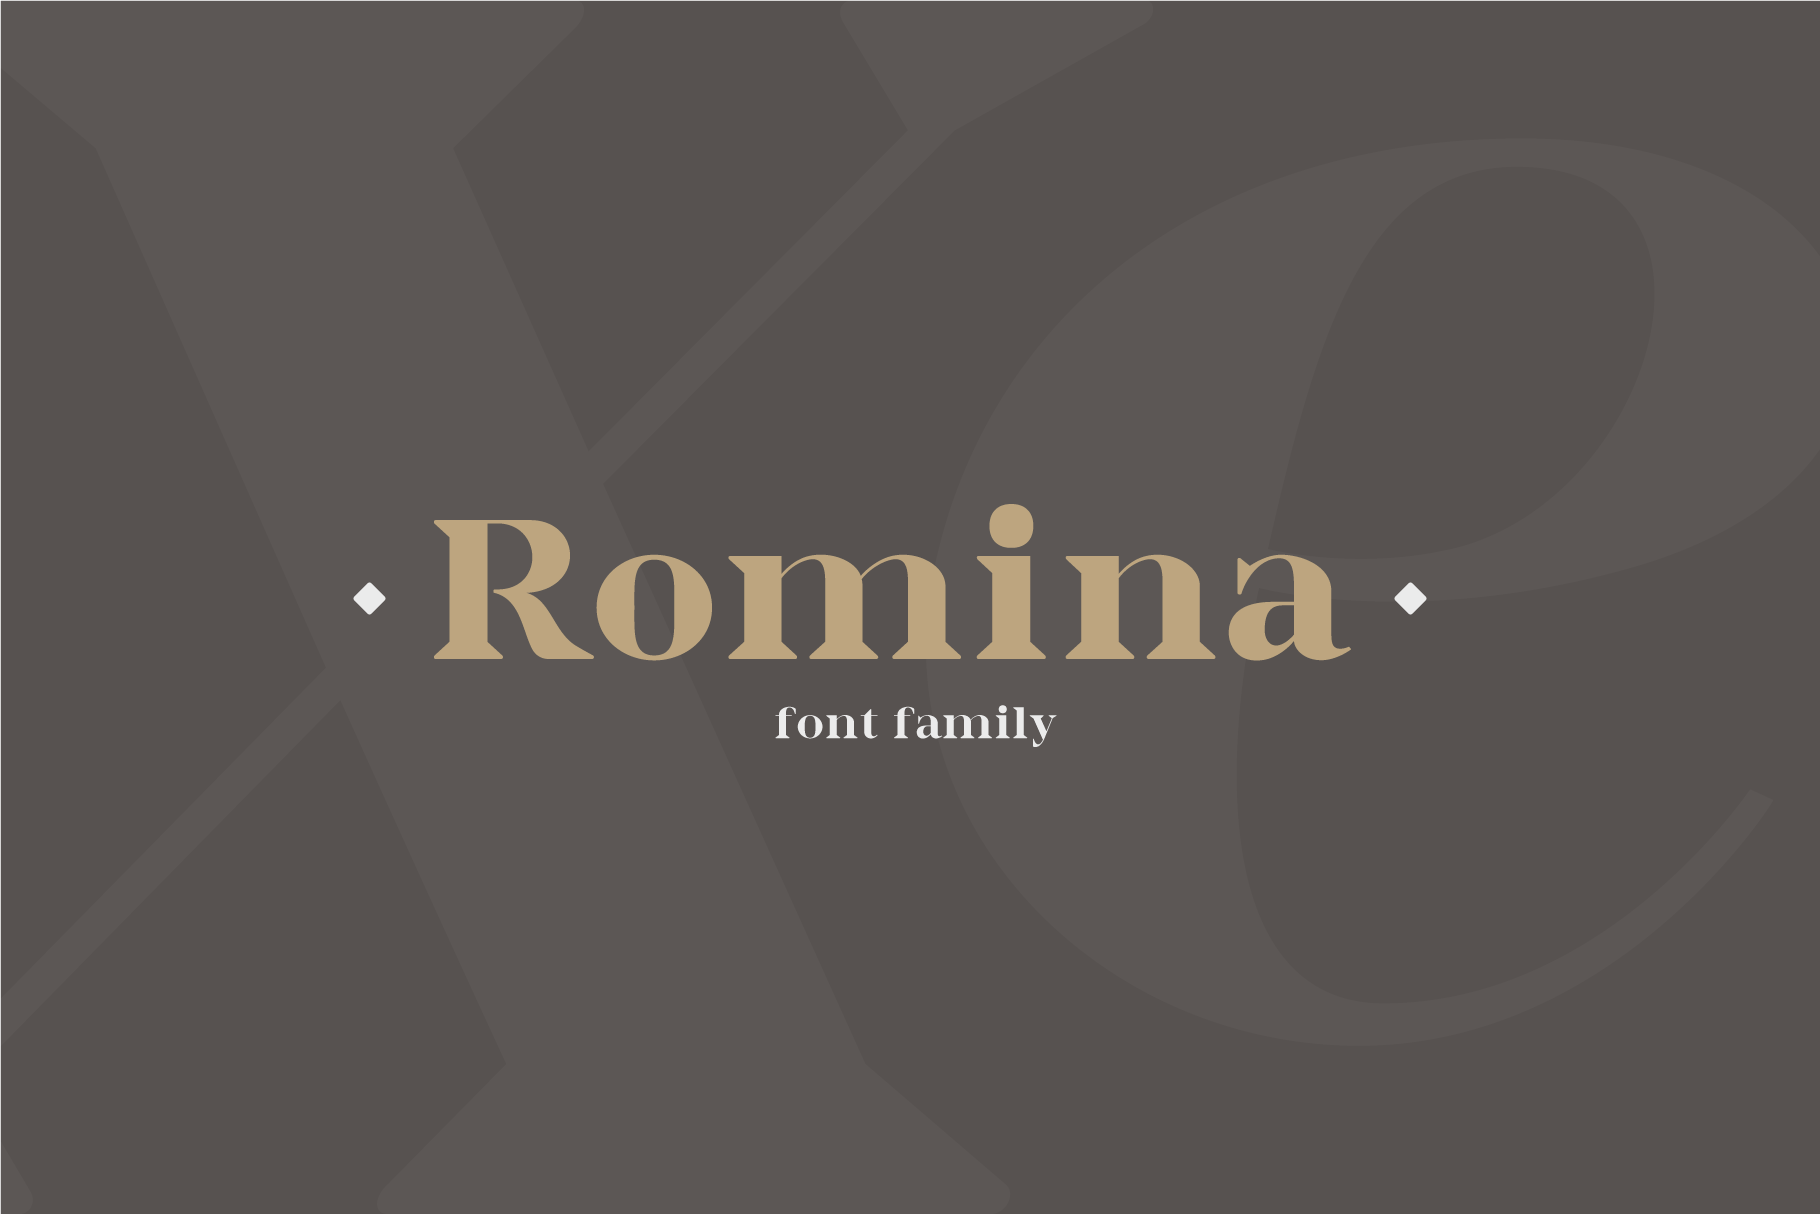 Romina example image 1